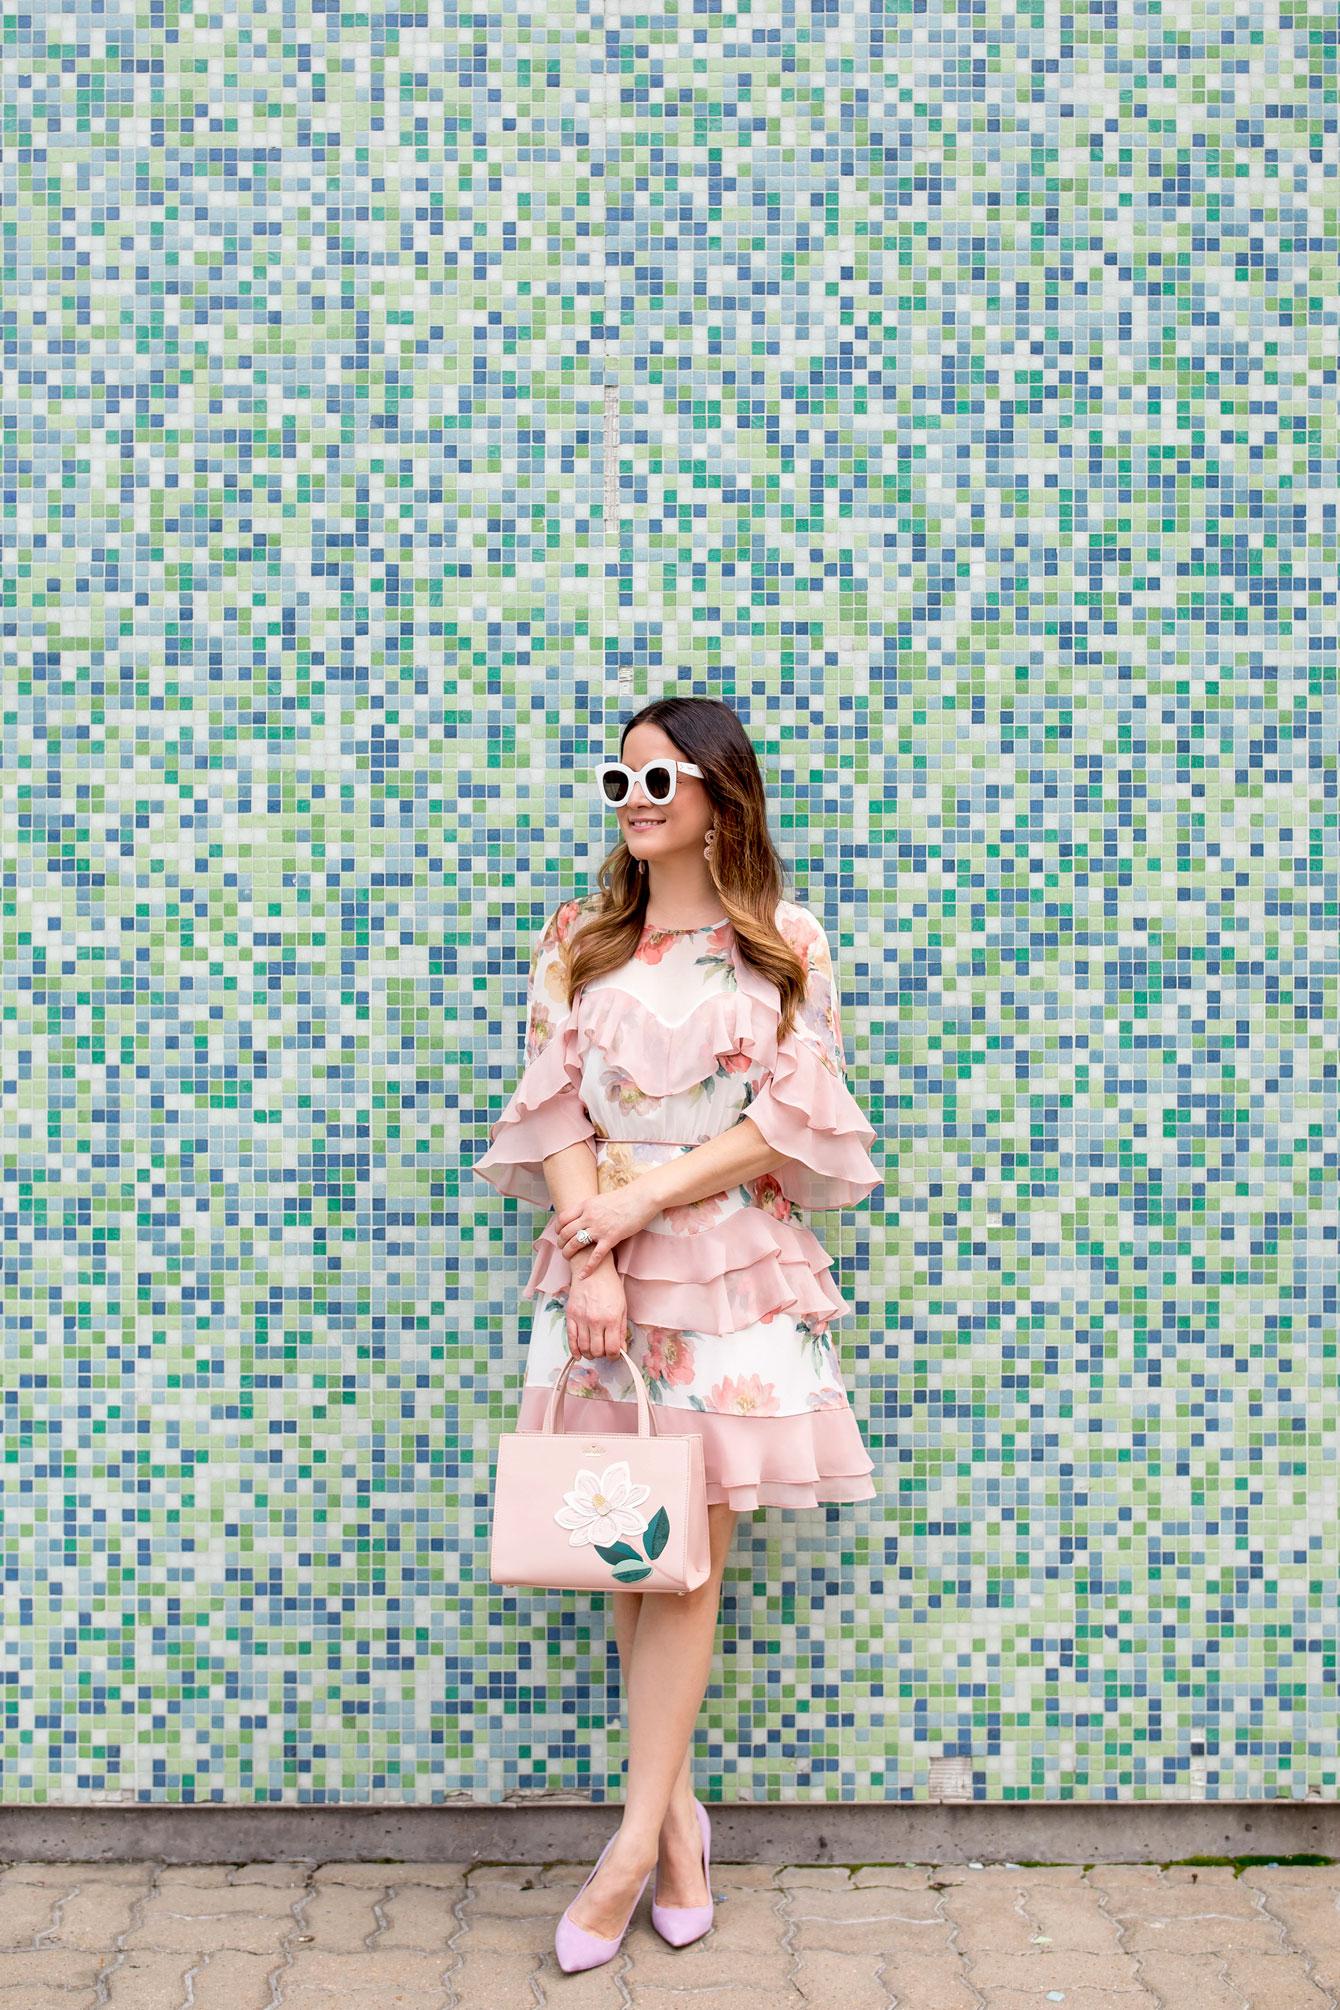 Green Tile Wall Houston